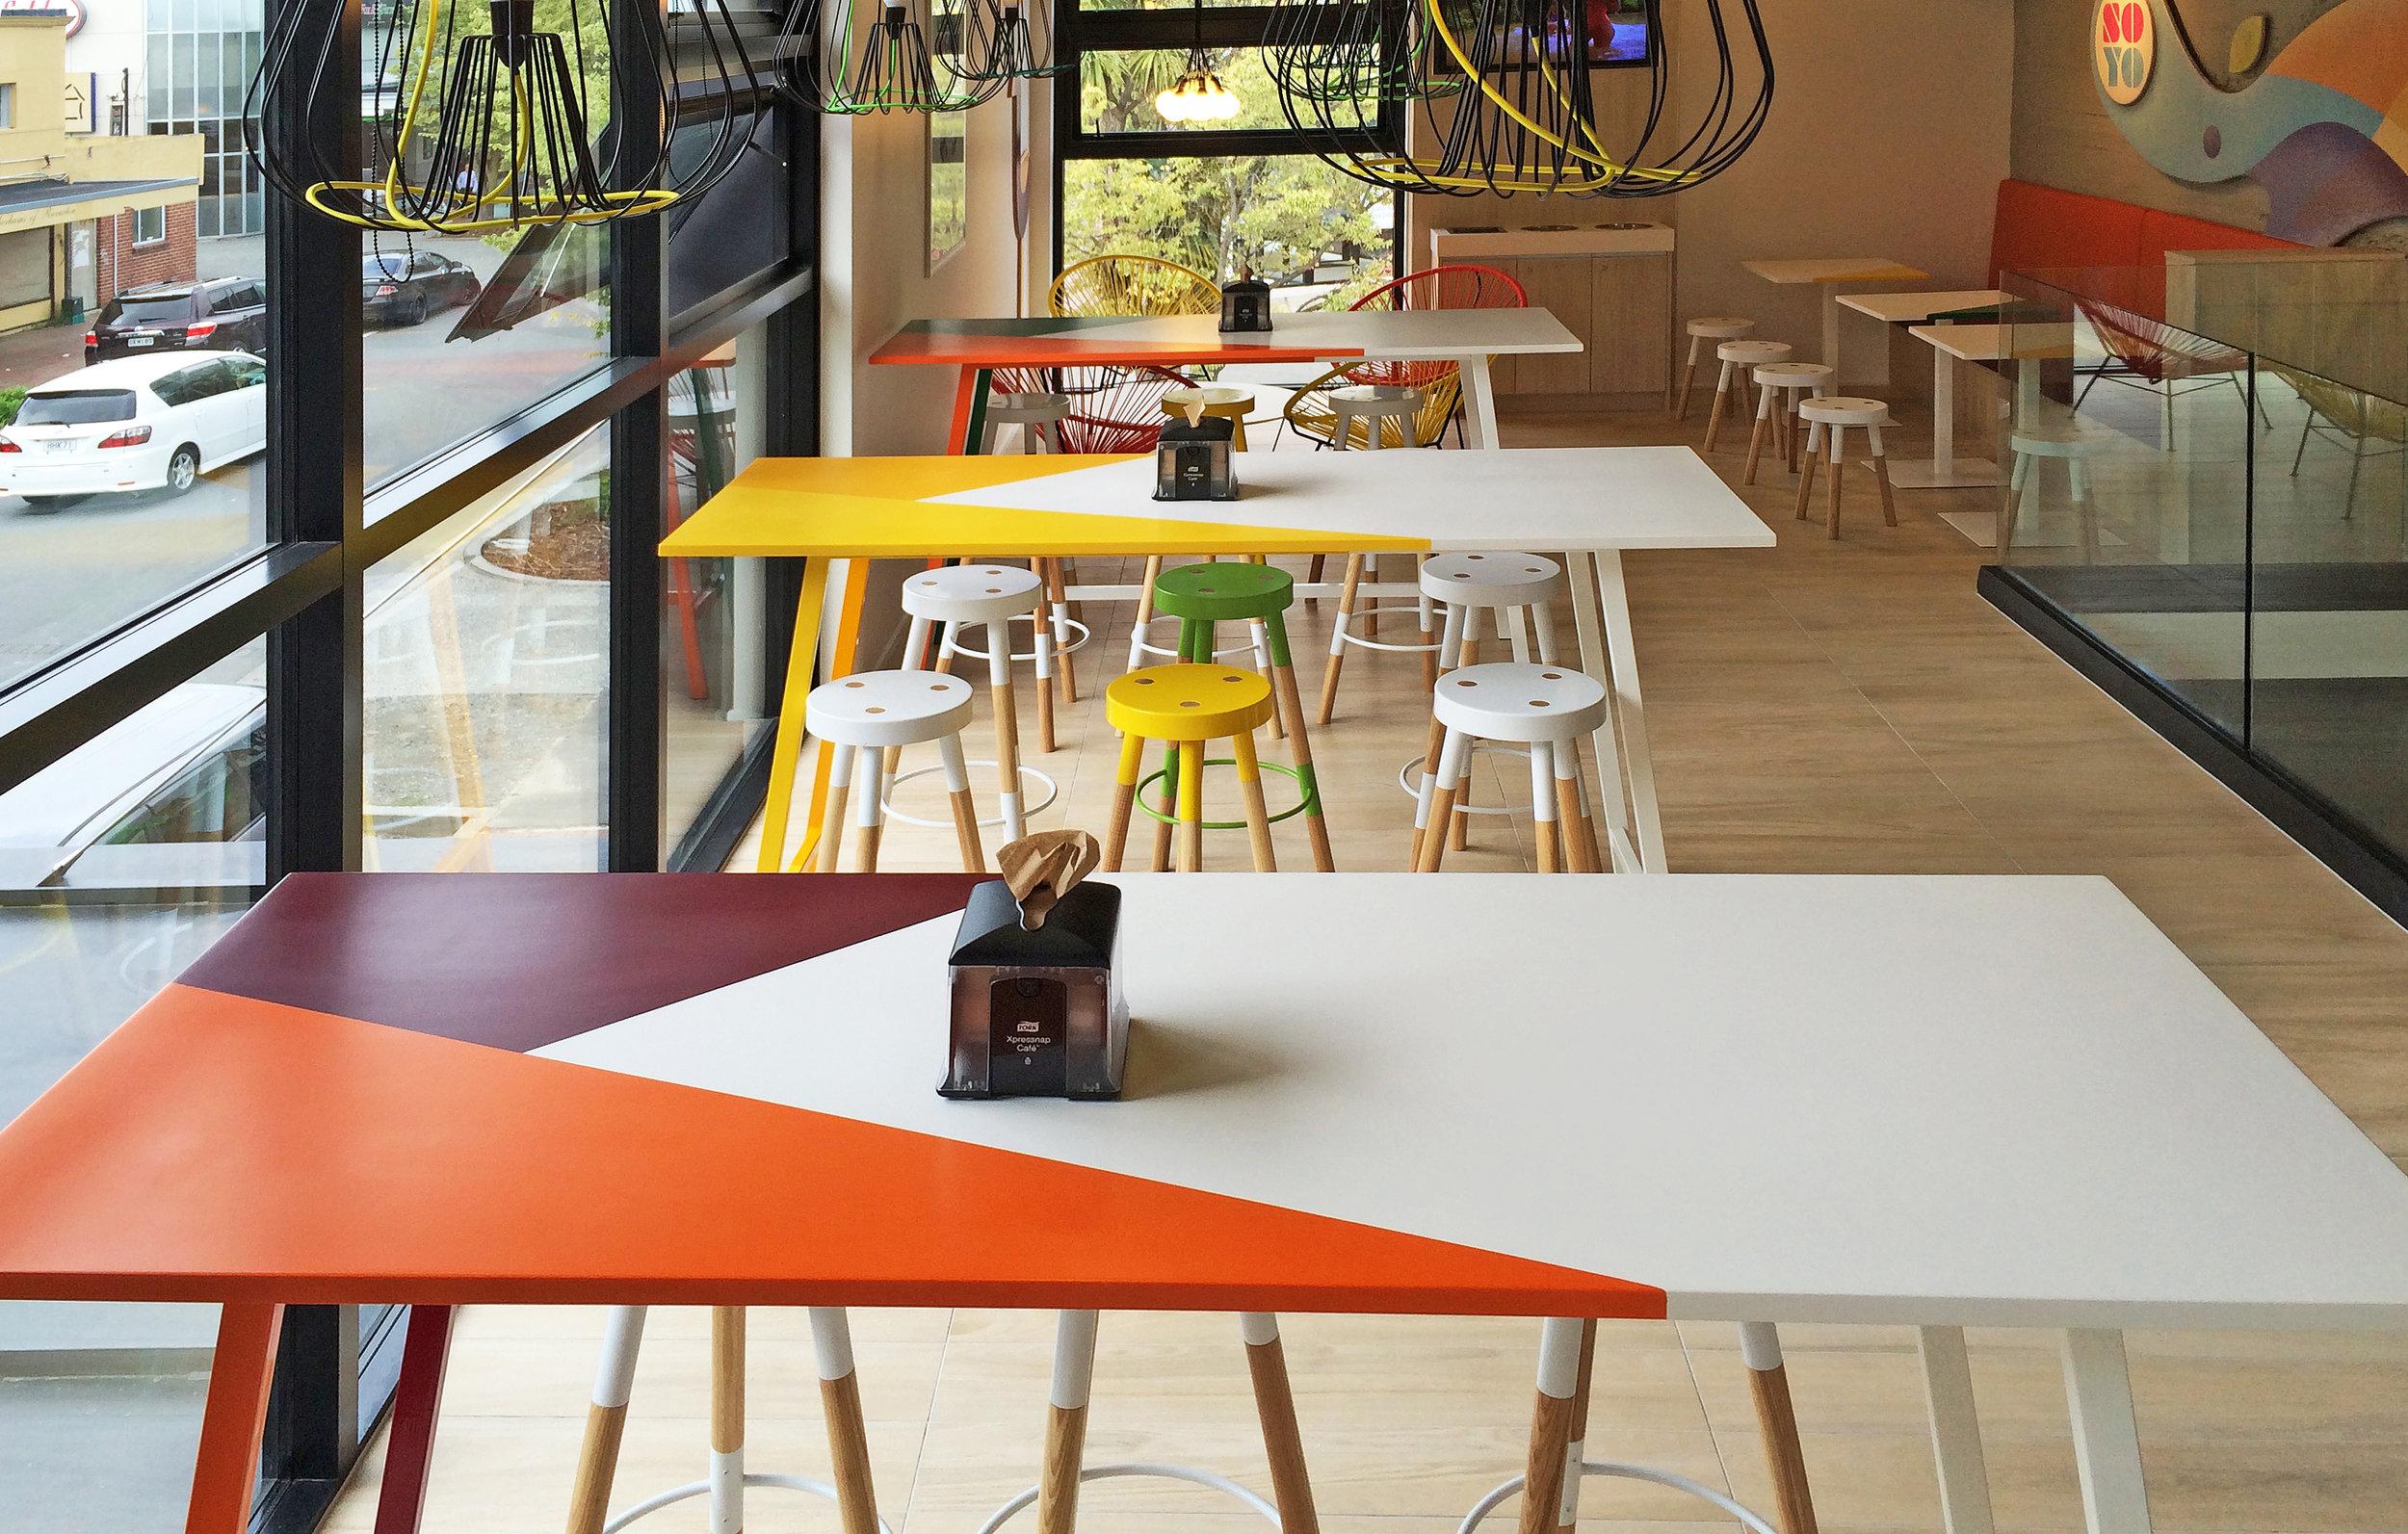 Soyo tables